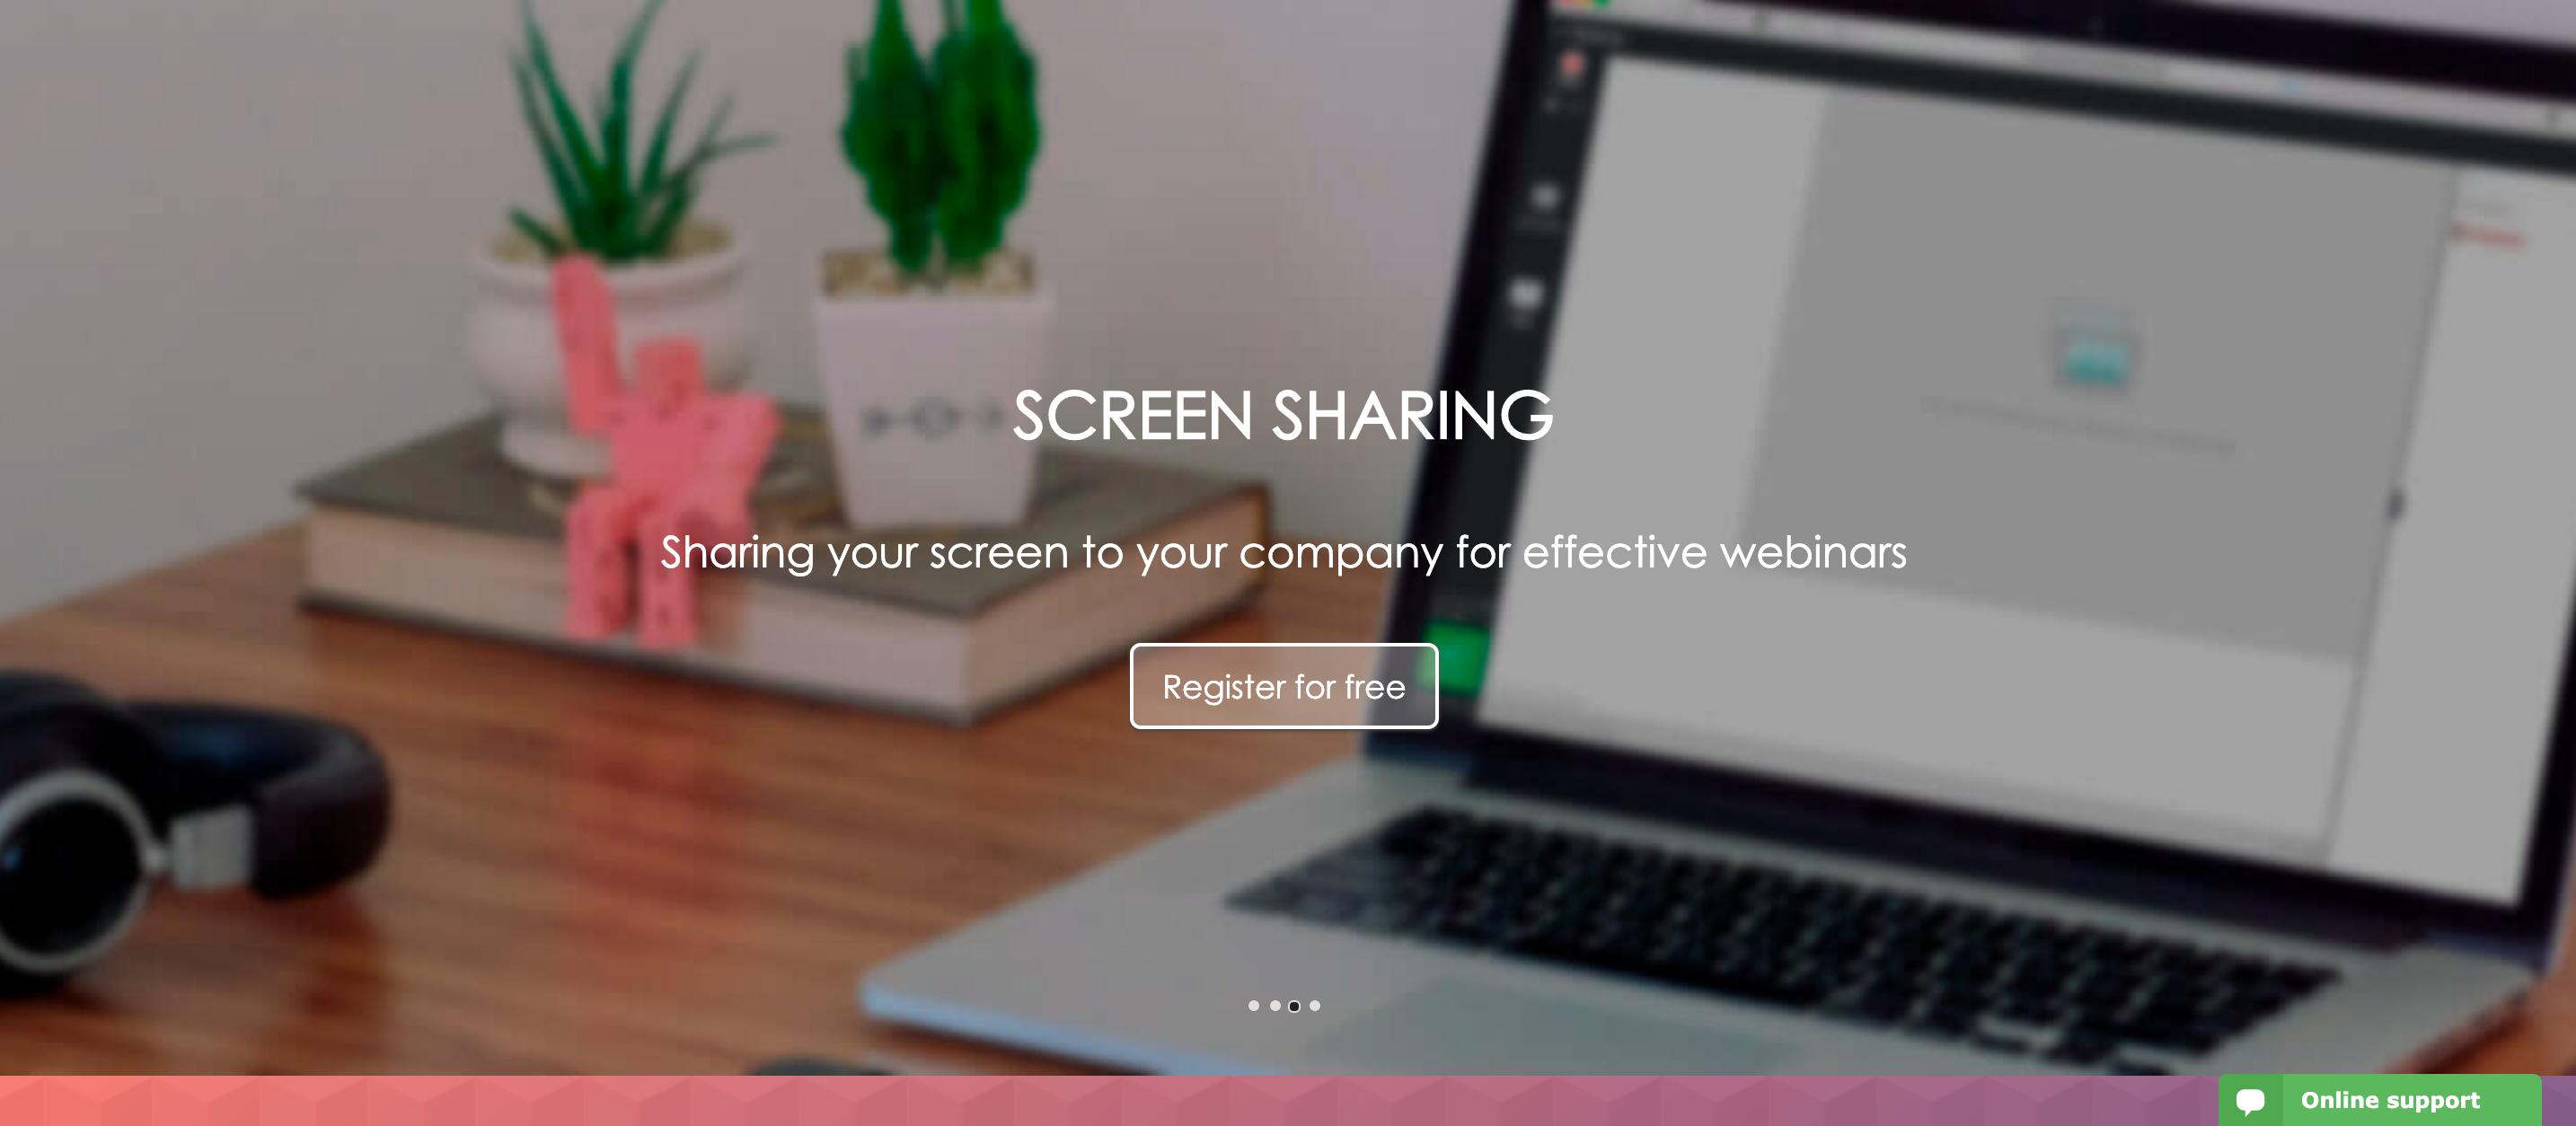 MyOwnConference Review - Screen Sharing